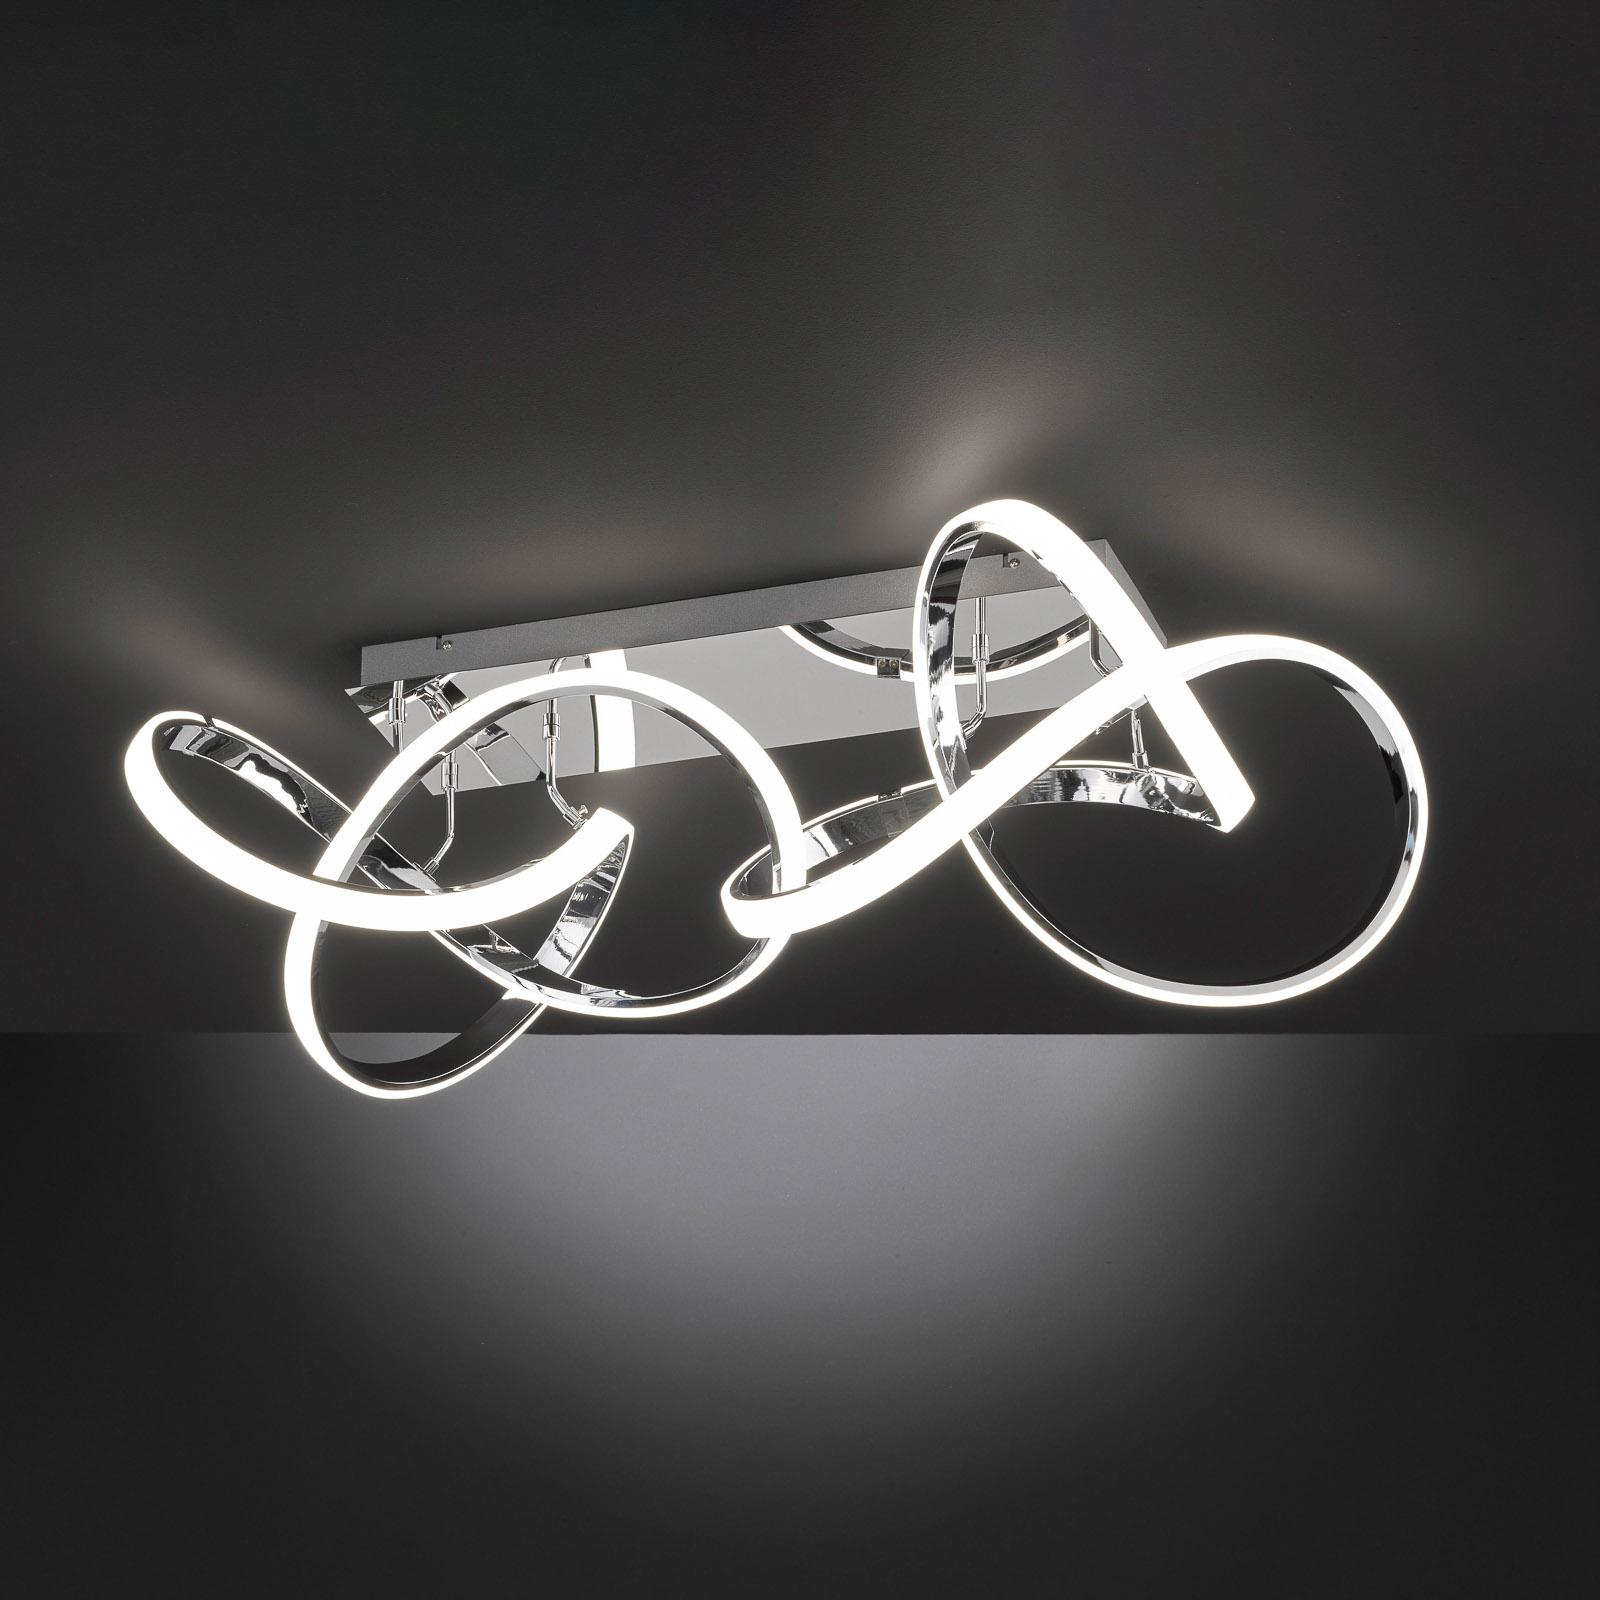 LED-taklampa Indigo 2 lampor, krom blank